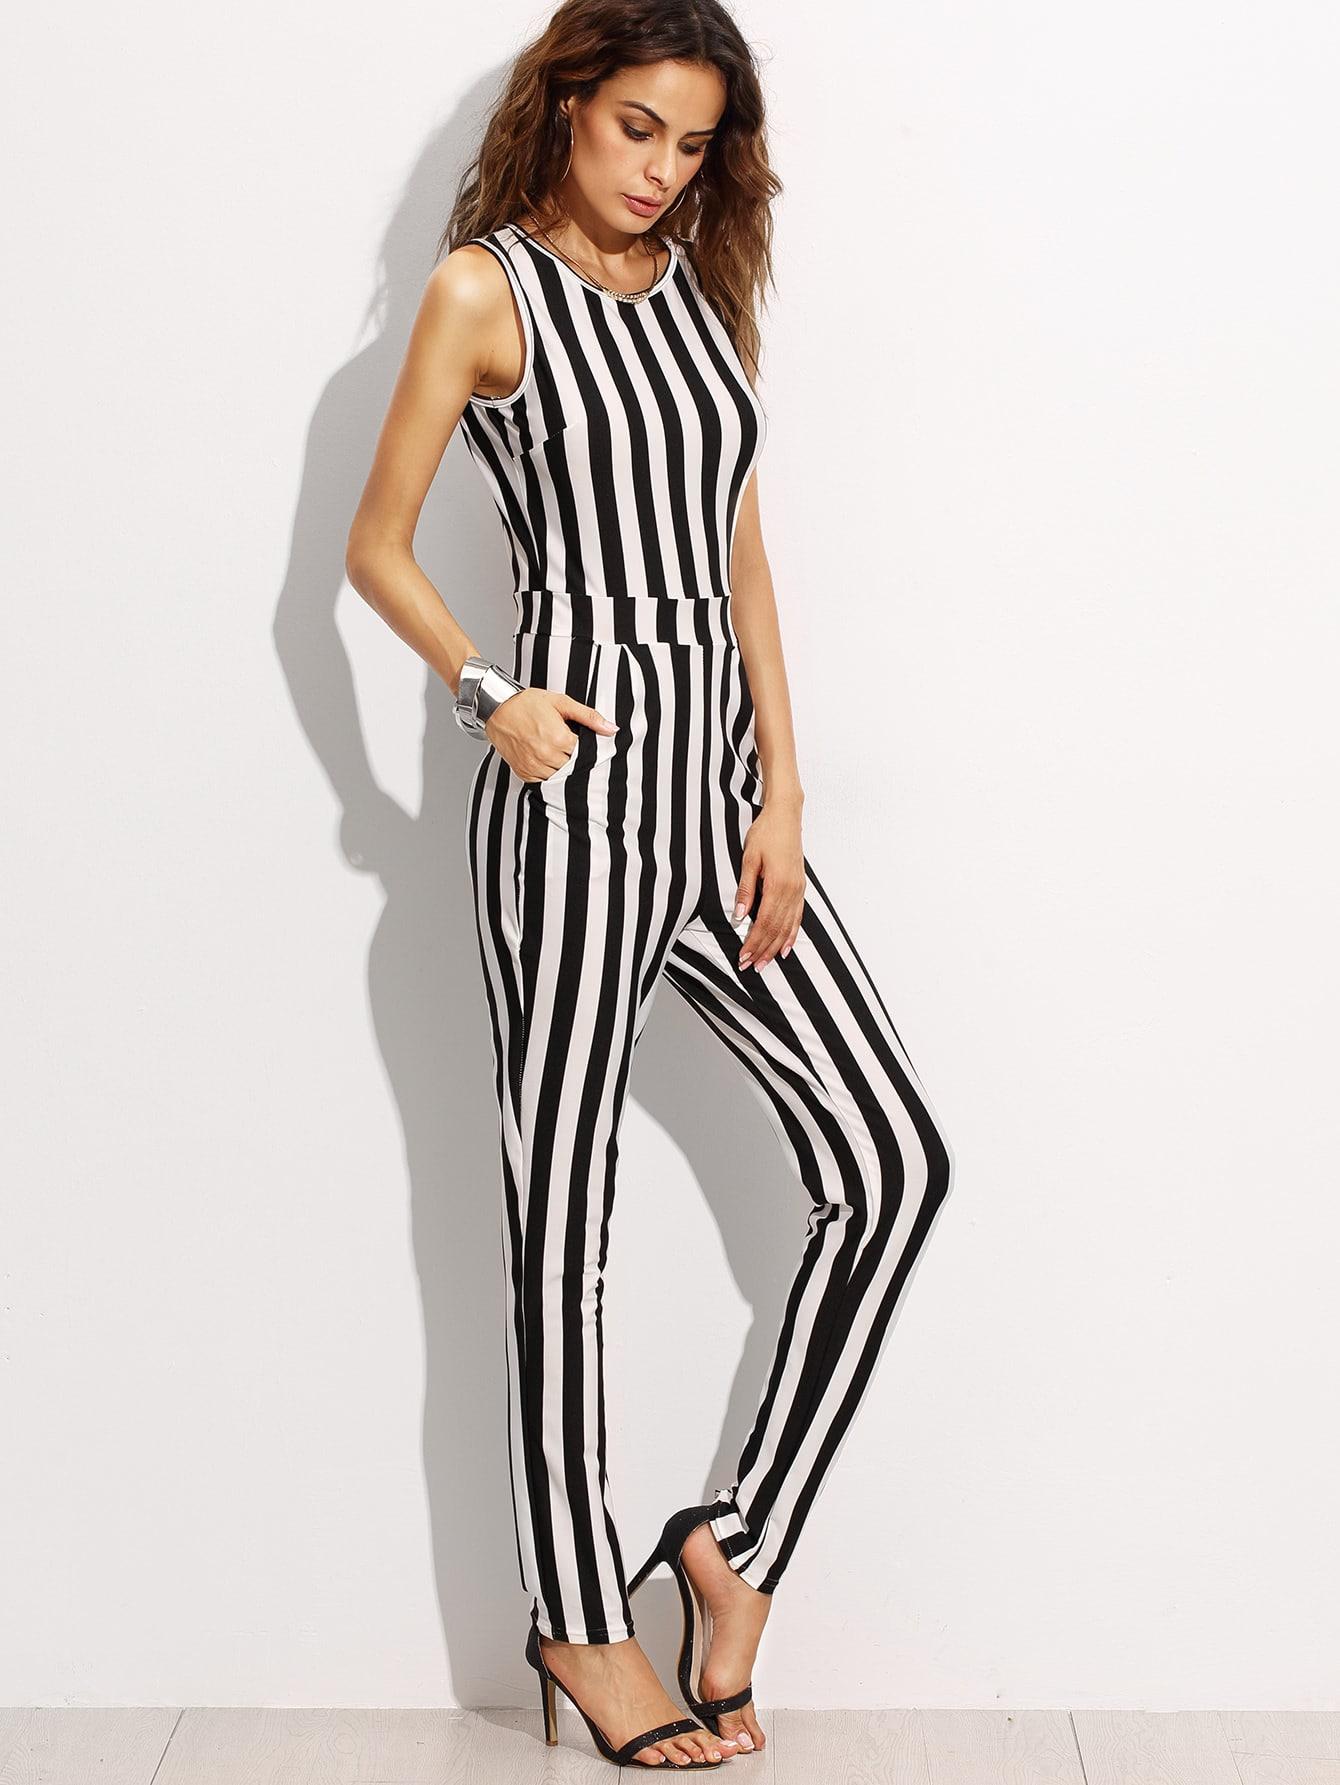 combi pantalons rayures verticales sans manche noir et blanc french shein sheinside. Black Bedroom Furniture Sets. Home Design Ideas